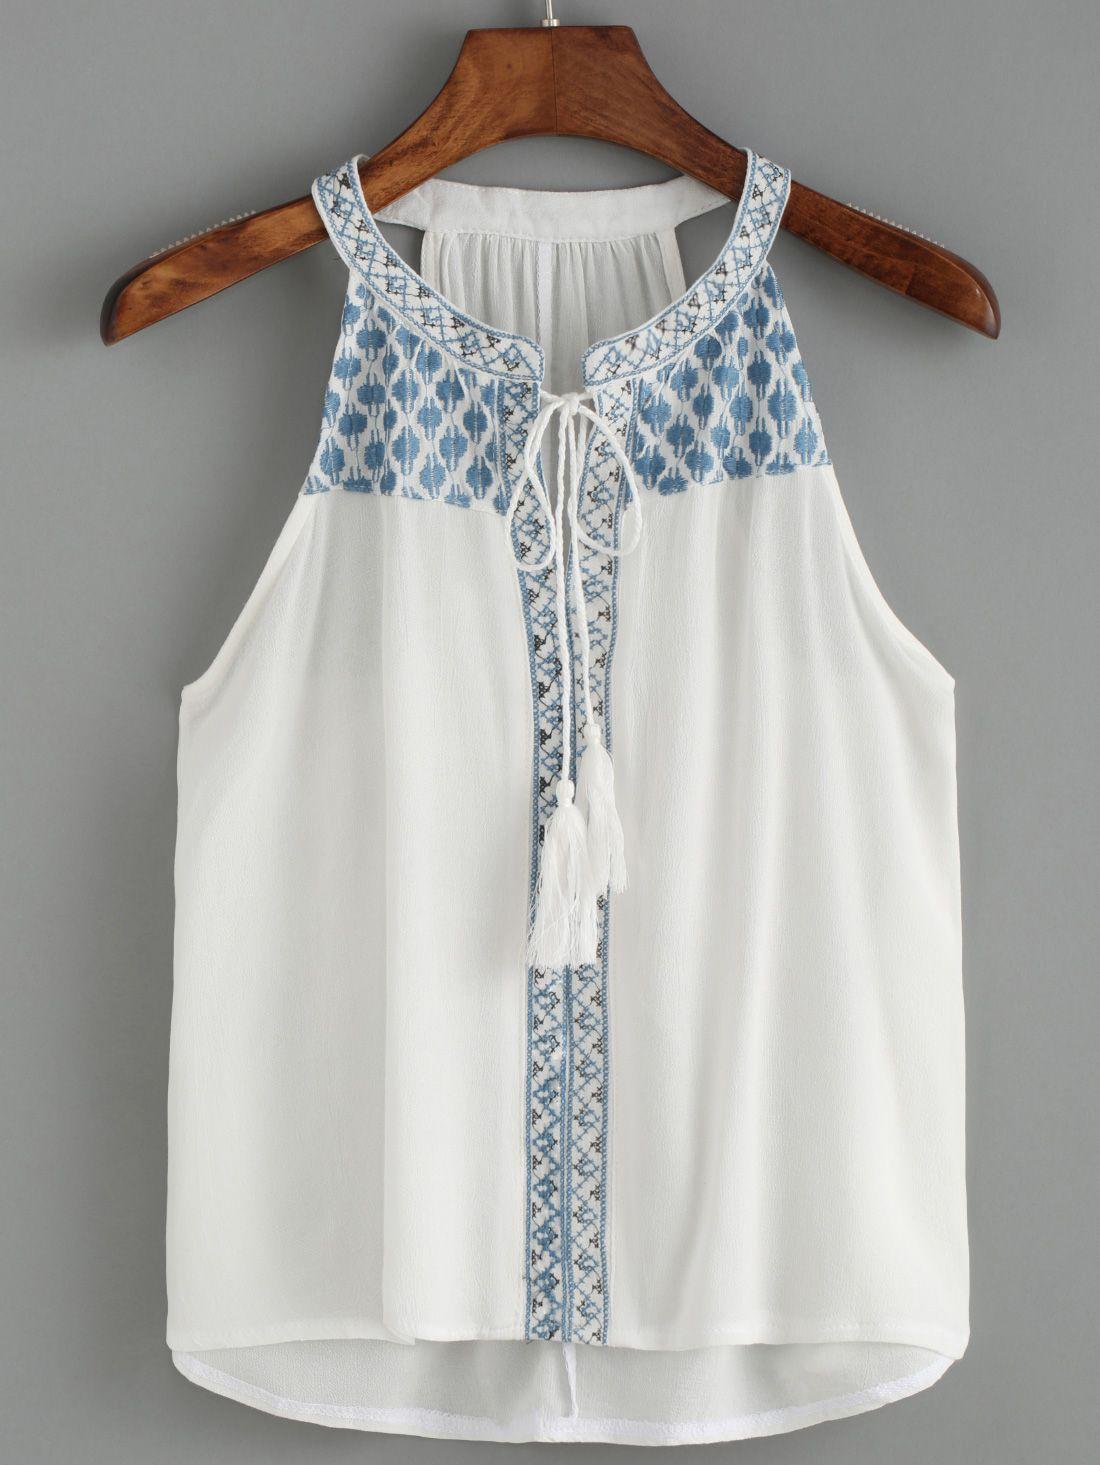 Halter Embroidered White Tank Top | customizar/ blusas verano ...